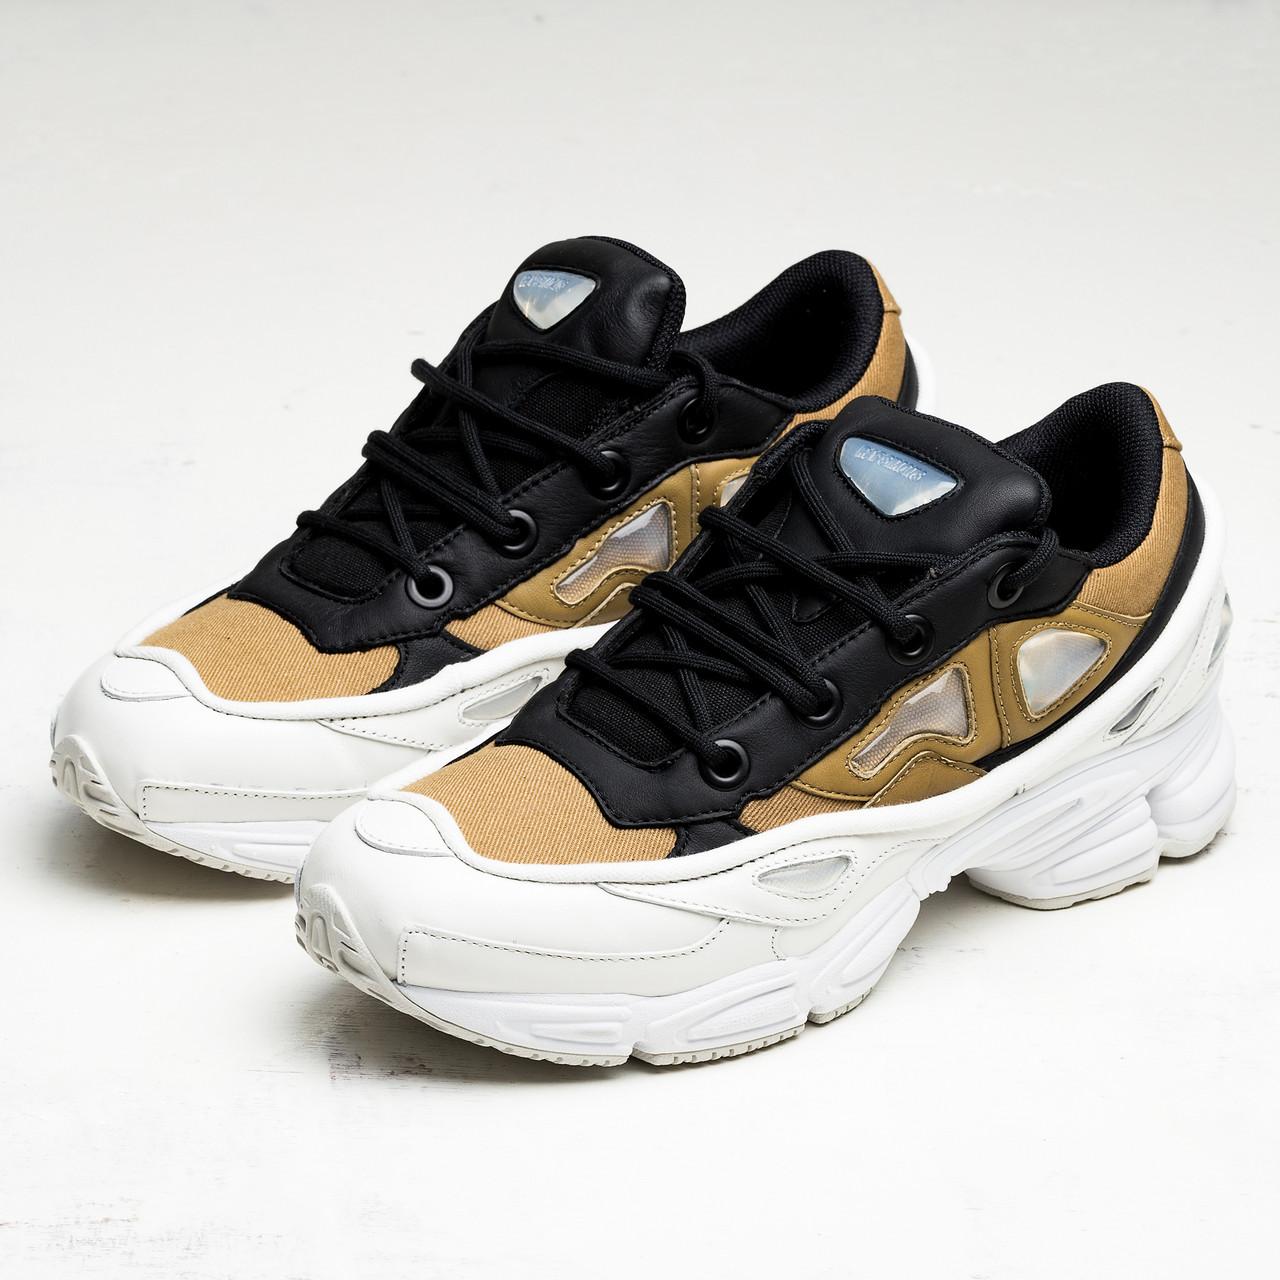 47fb5a372384 Женские кроссовки Adidas x Raf Simons Ozweego 2